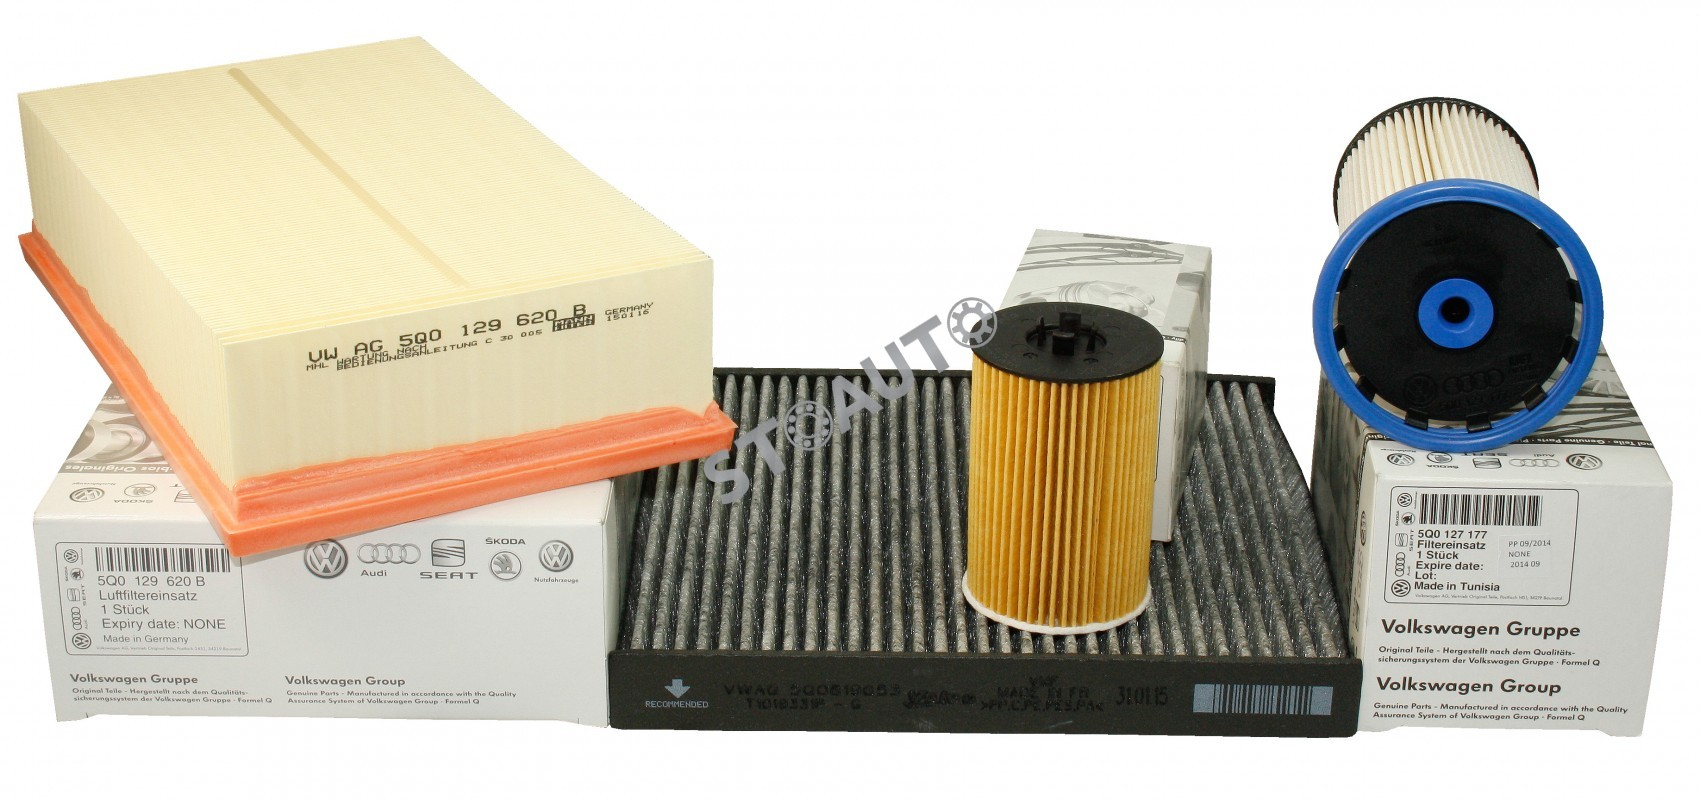 1518076777Set filtre revizie originale VW Golf 7 1.6 TDI 105 cai